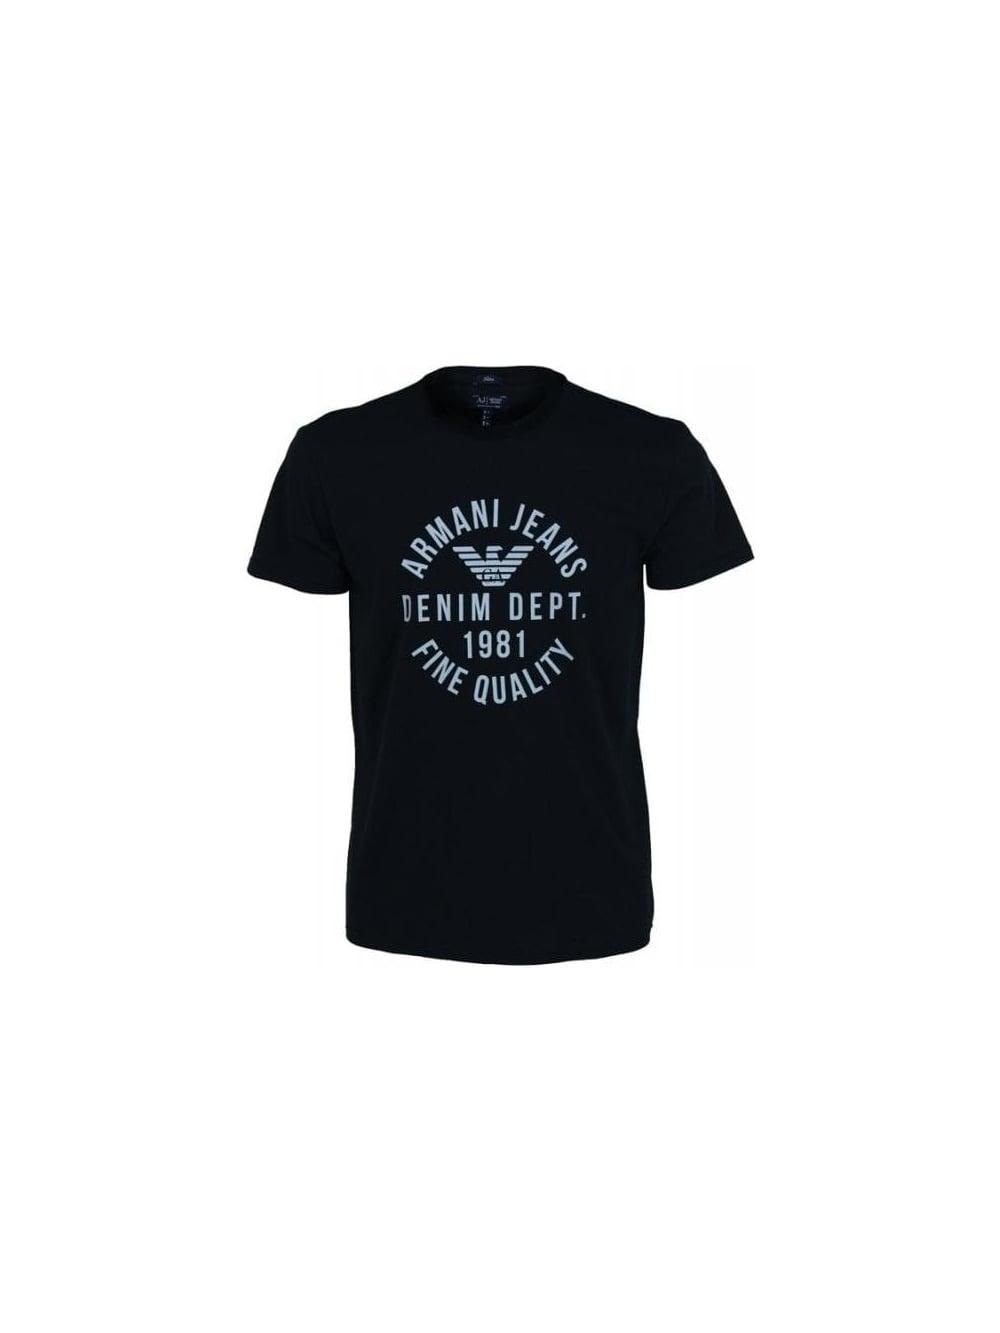 Jeans Armani Threads Black shirt Northern Slim Dept 1981 In Denim T gPwPOqd